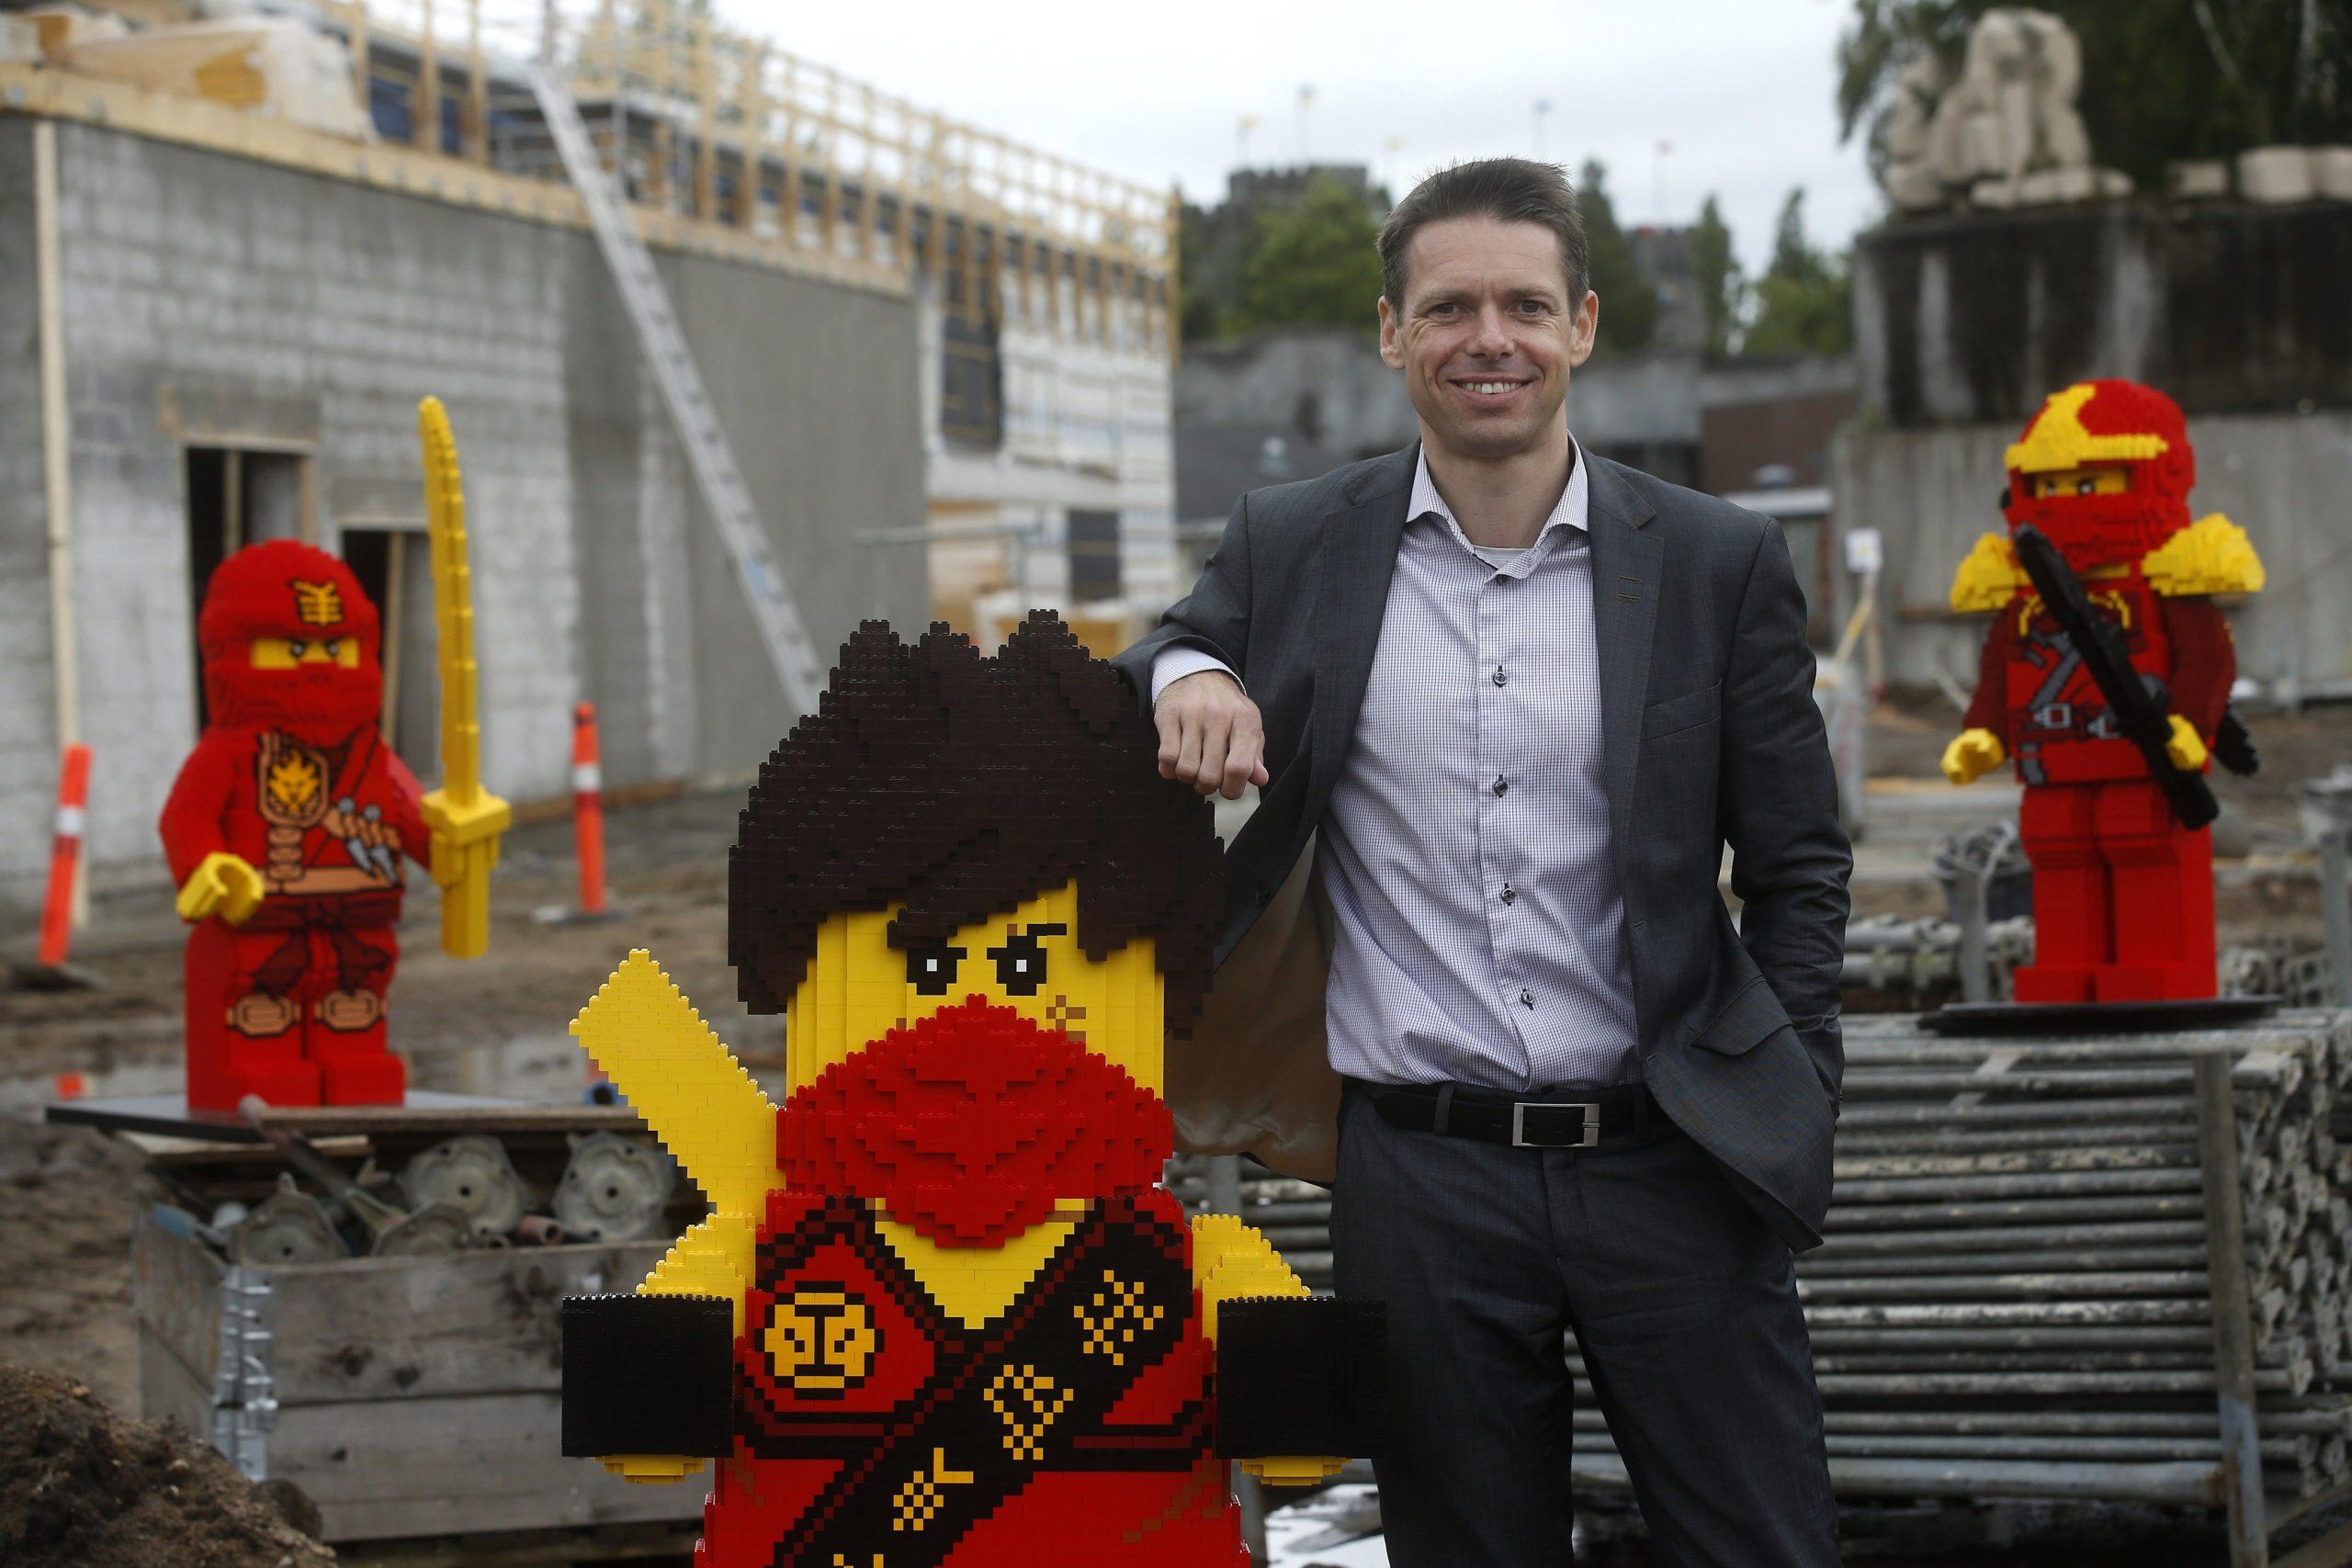 De mange coronarestriktioner gjorde 2020 til et trist år for også Legoland i Billund. Her er det administrerende direktør Christian Woller. Pressefoto: Legoland.